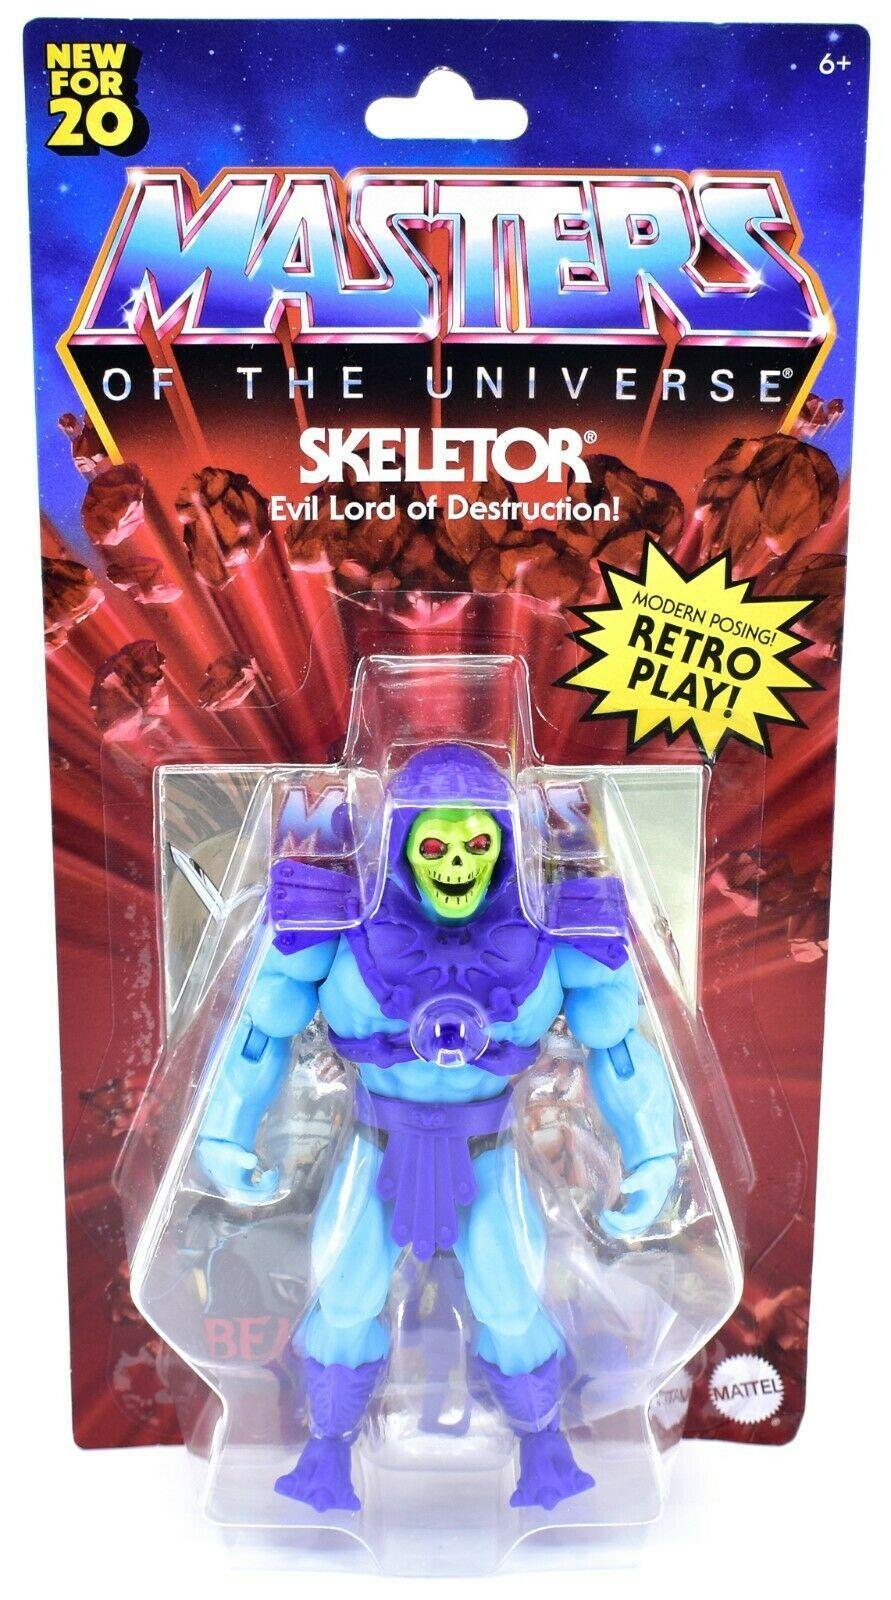 Mattel Masters of the Universe MOTU Skeletor Retro Play Action Figure GNN88